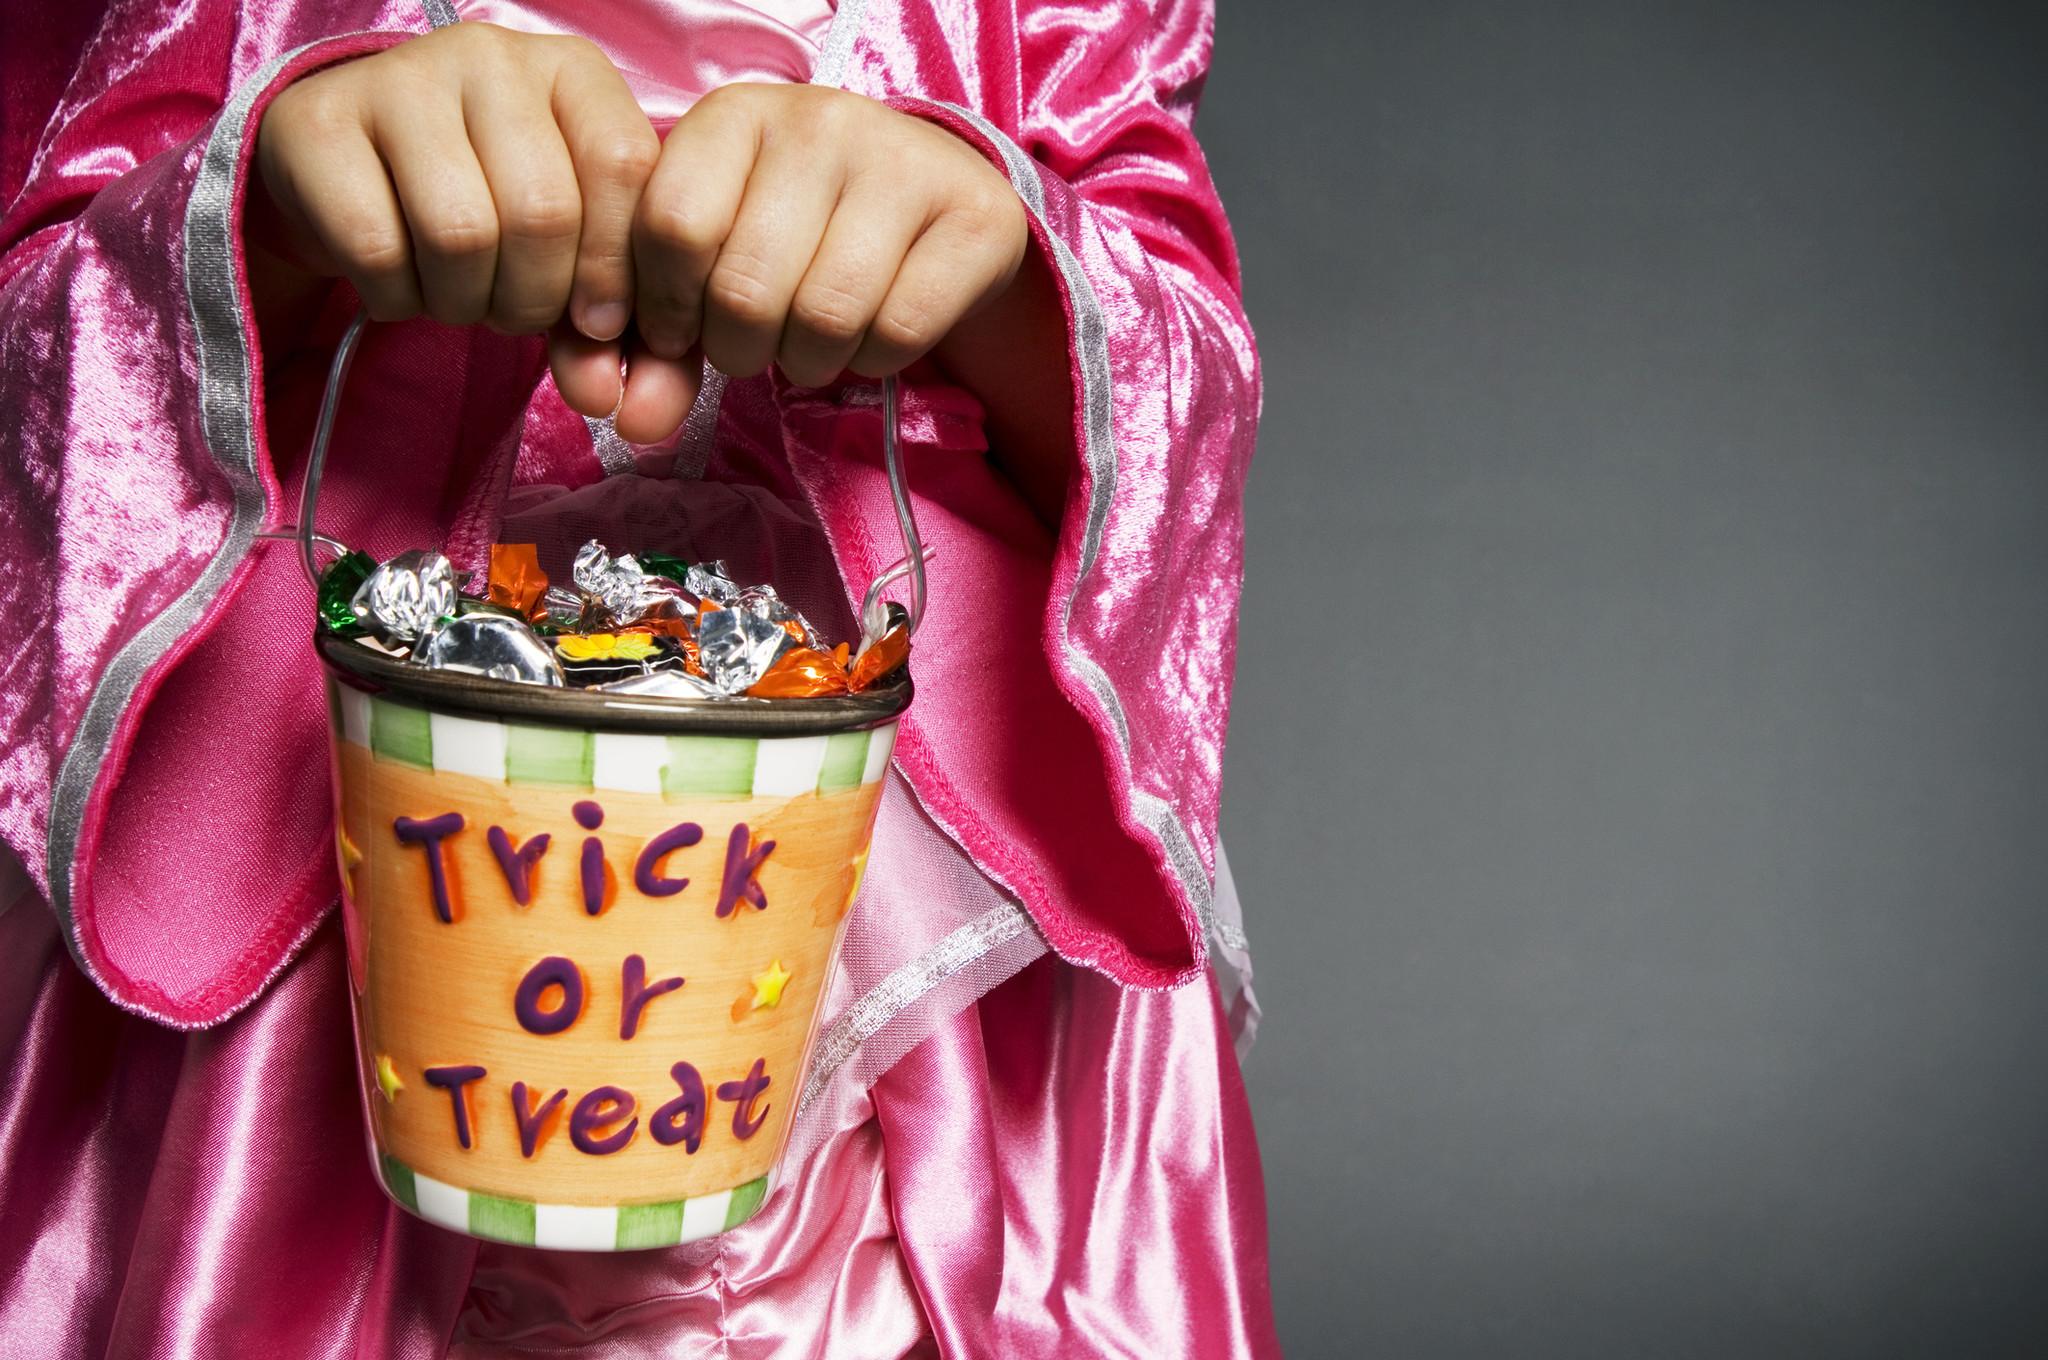 Pizza Hut Is Offering 50 Percent Off Pizza This Week ...   Halloween Pizza Hut Deals